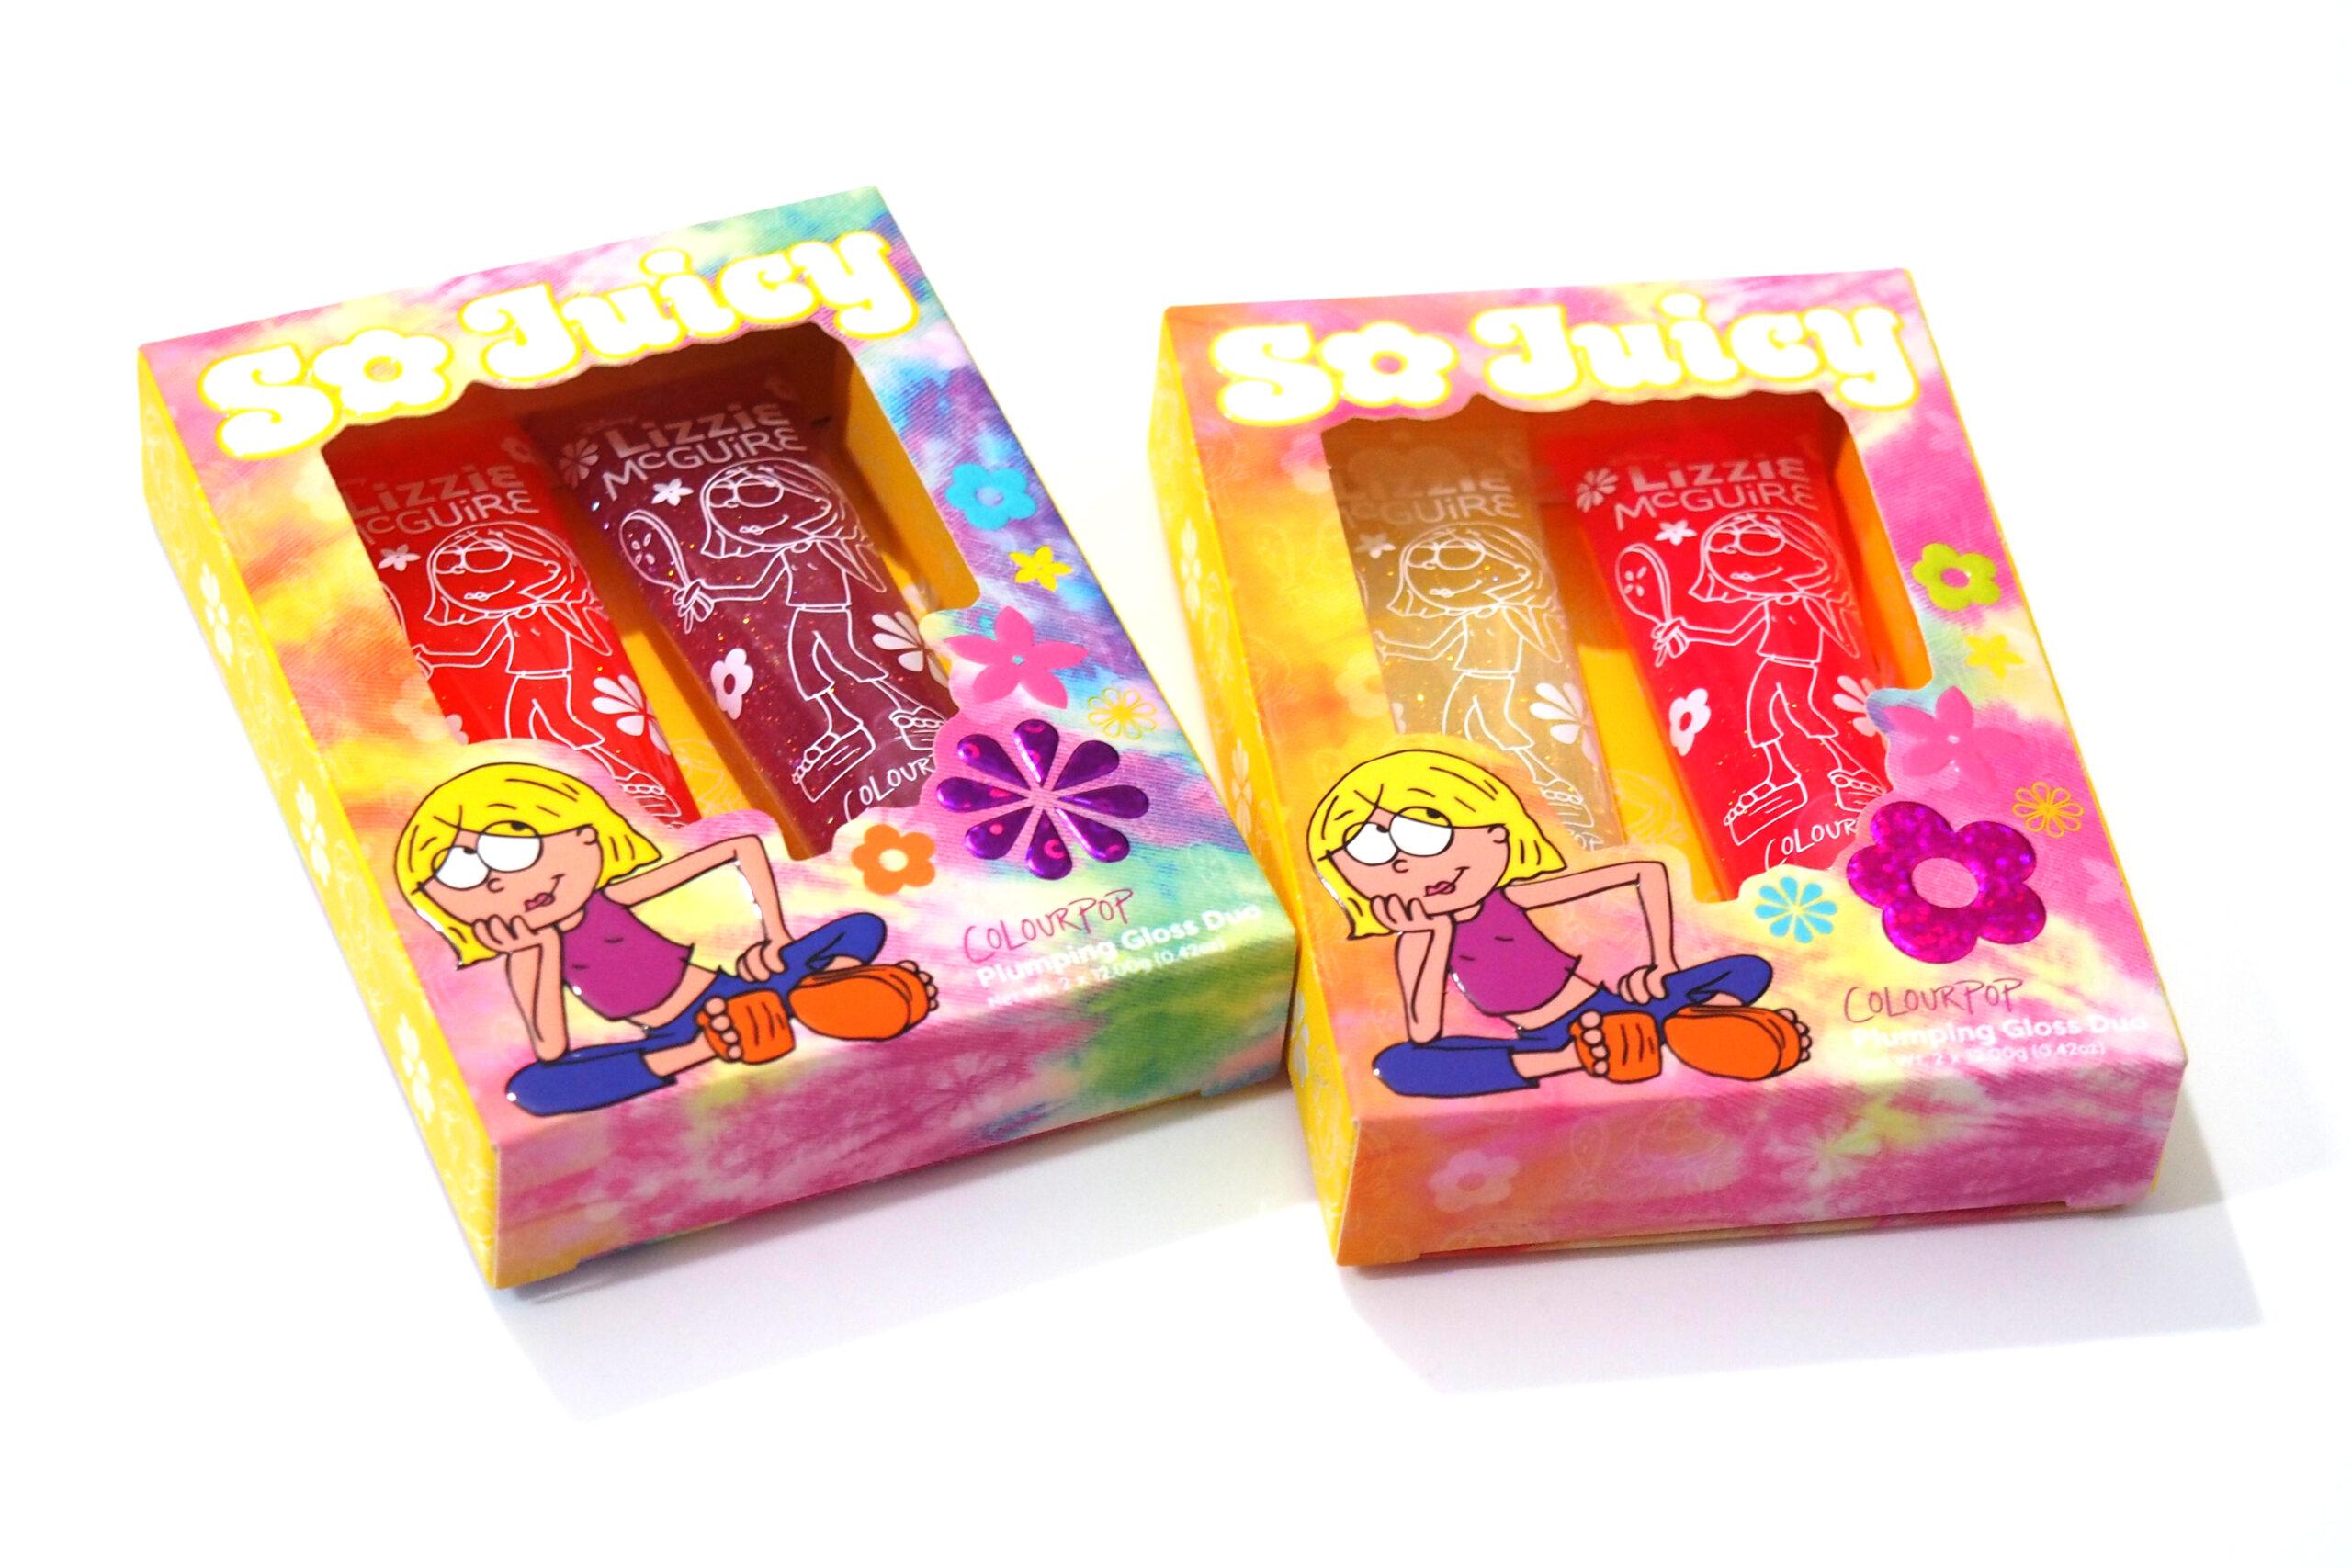 ColourPop x Disney Lizzie McGuire Collection Review / Swatches